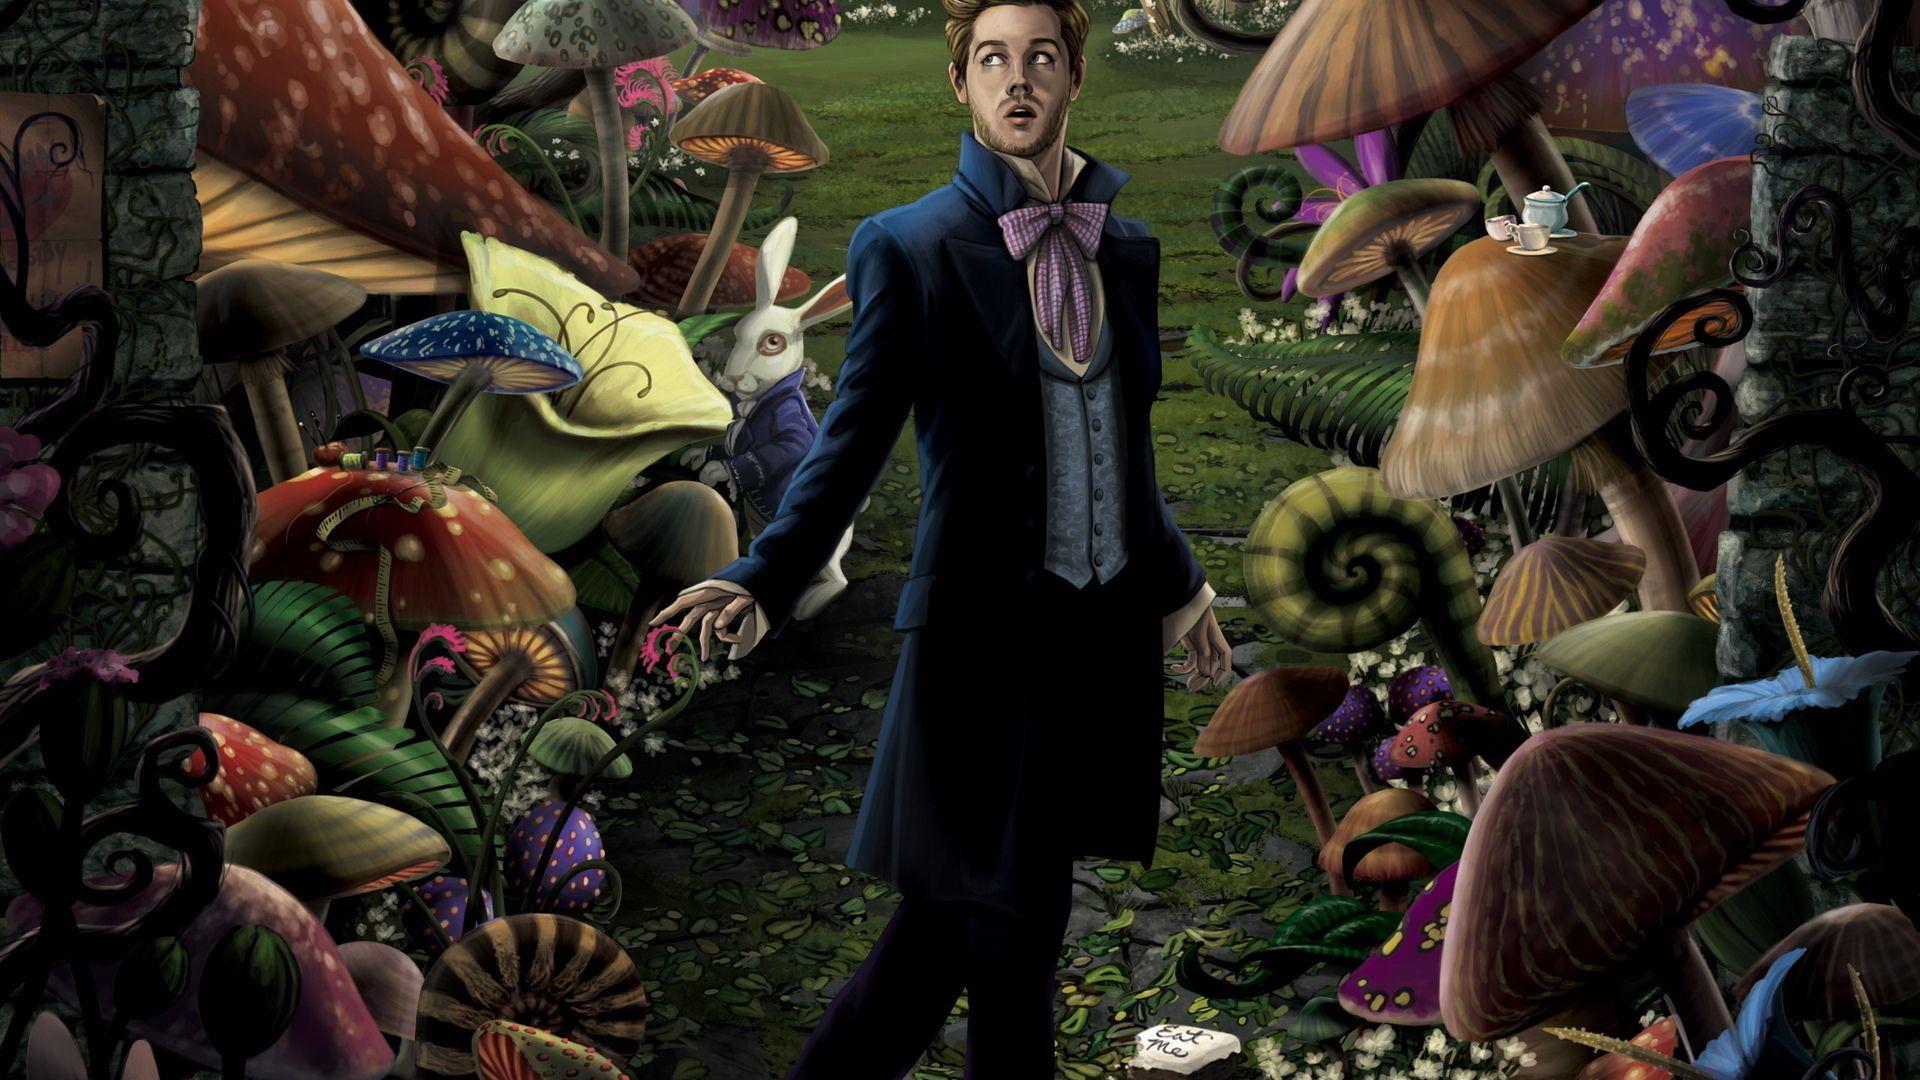 Alice In Wonderland Pictures 2